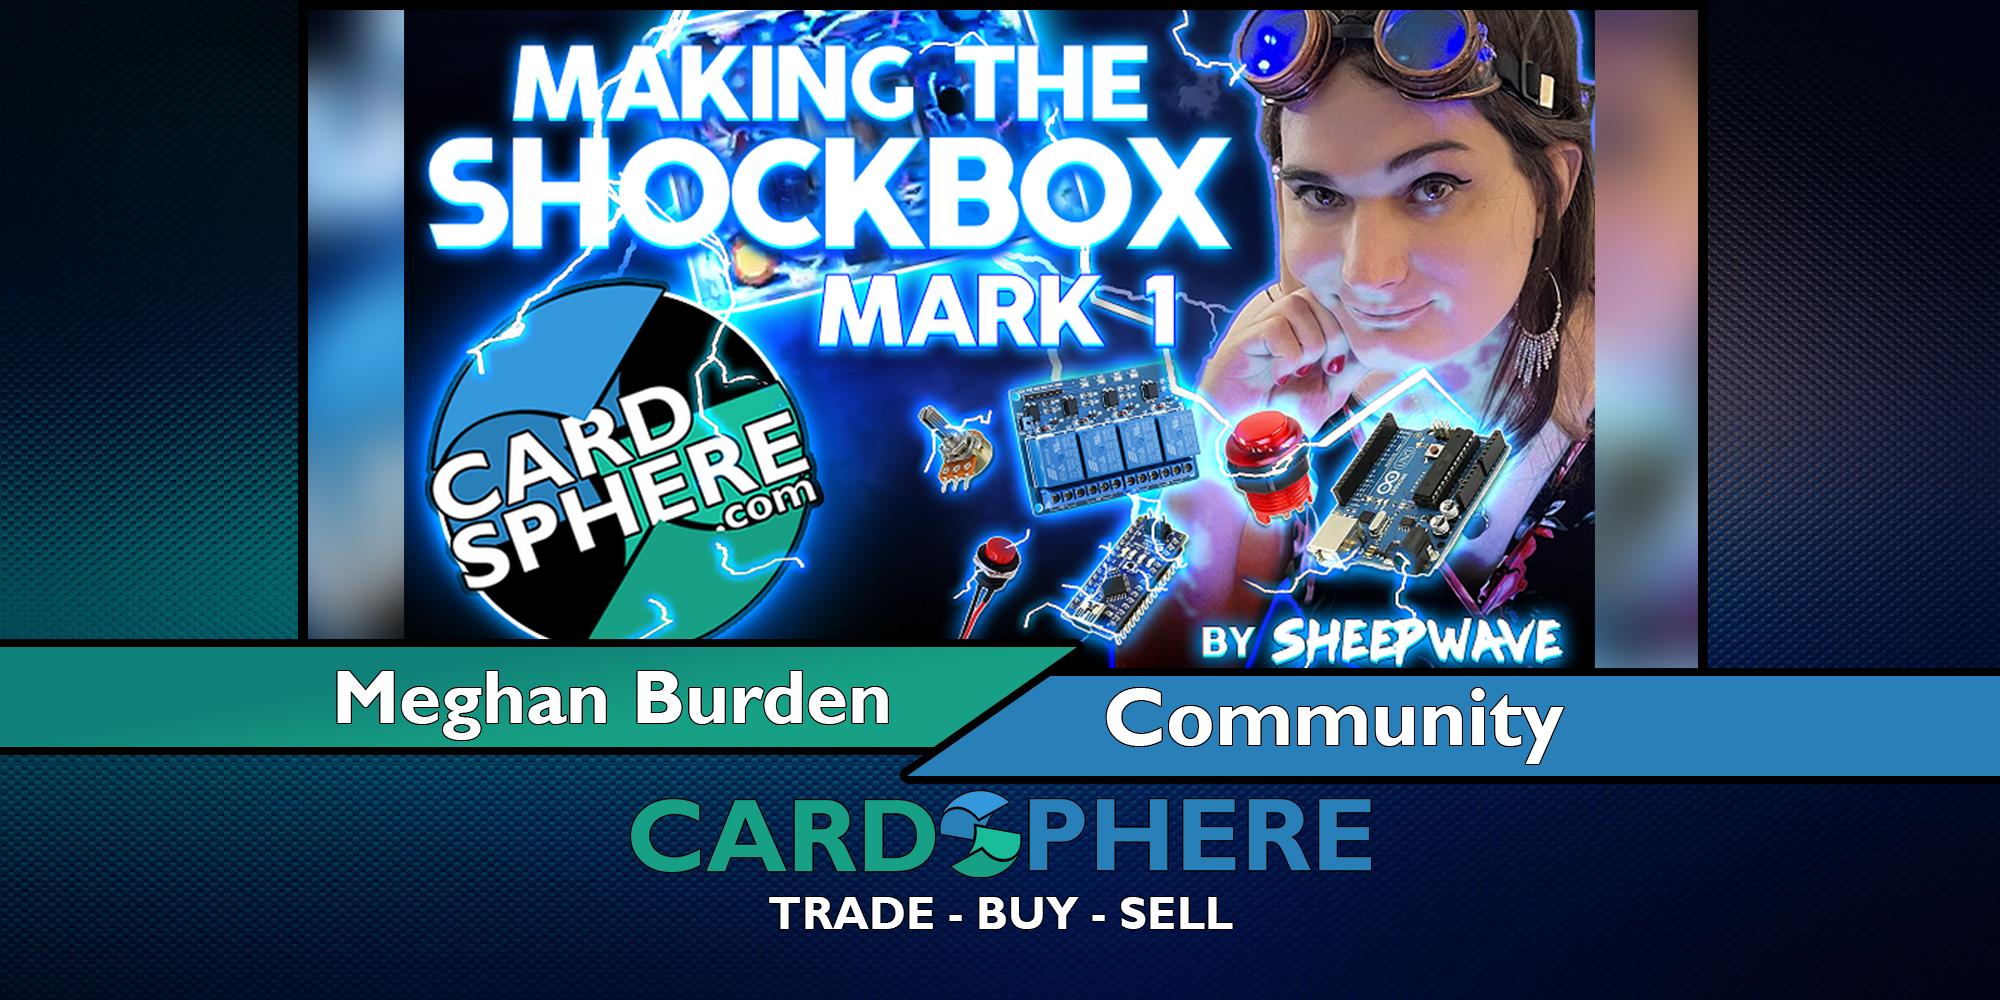 Making the Shockbox: Mark 1